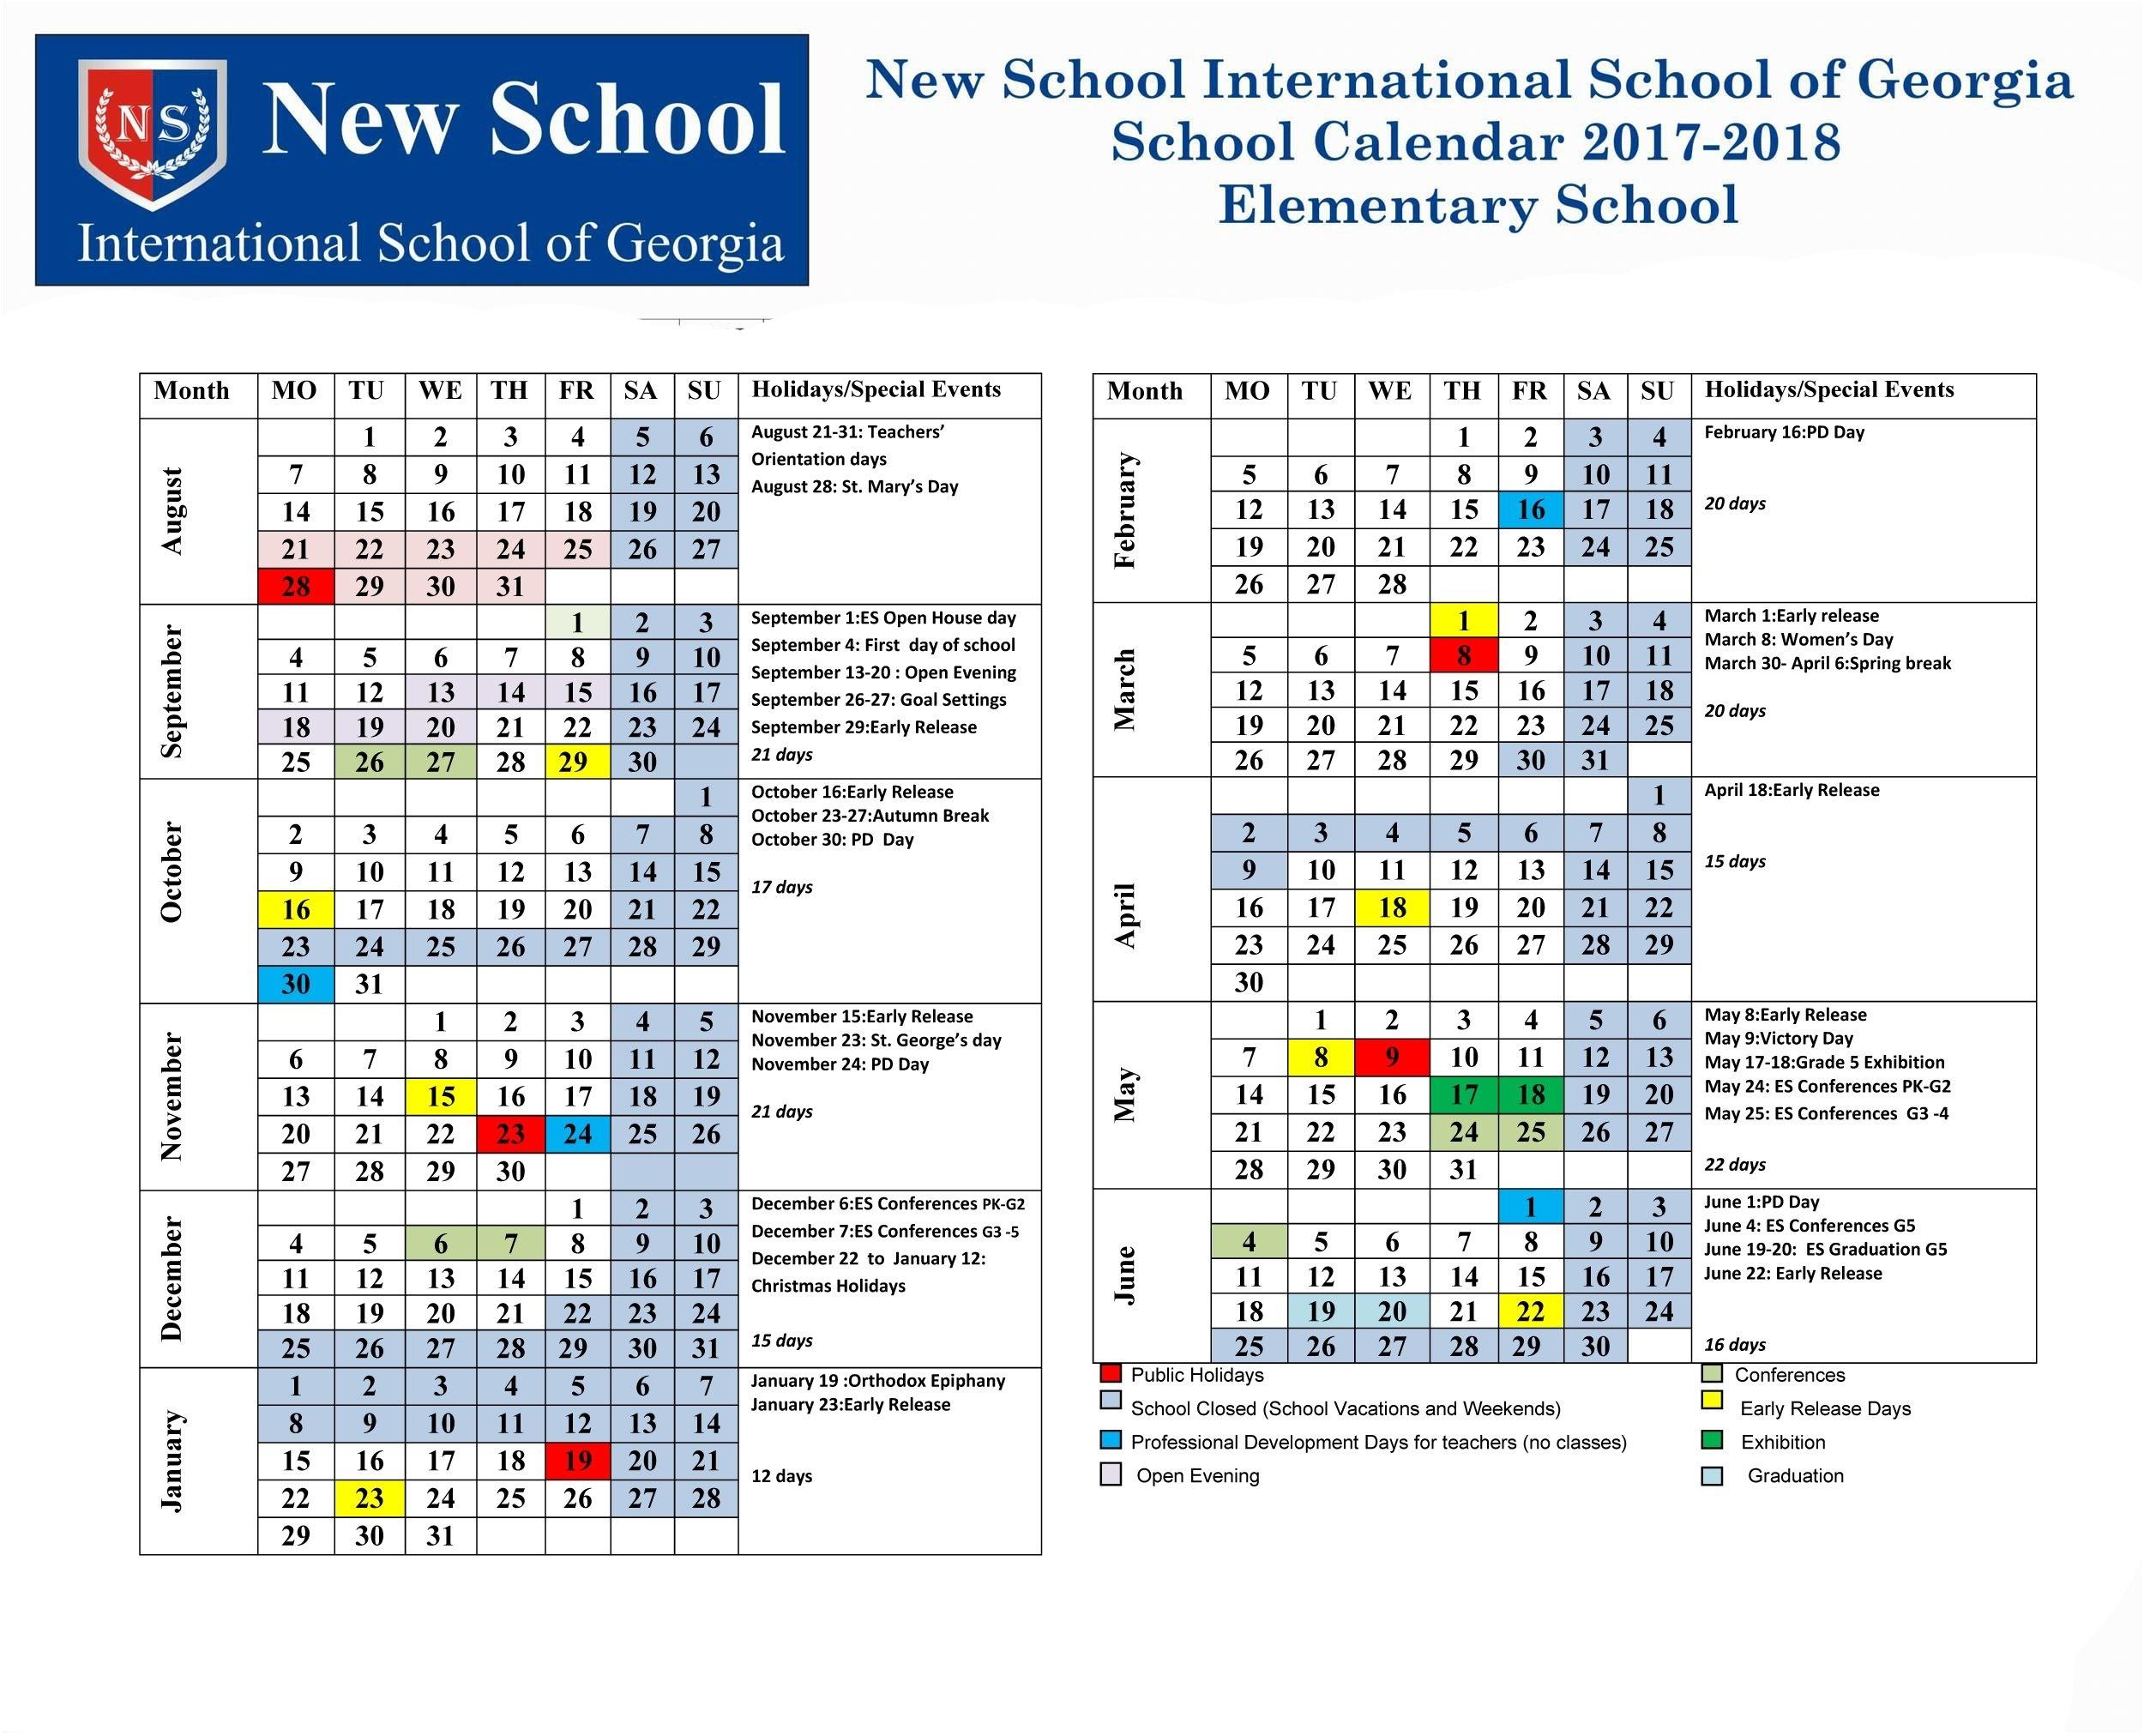 Success Academy Calendar 2017 To Download Or Print_Region 9 School Calendar